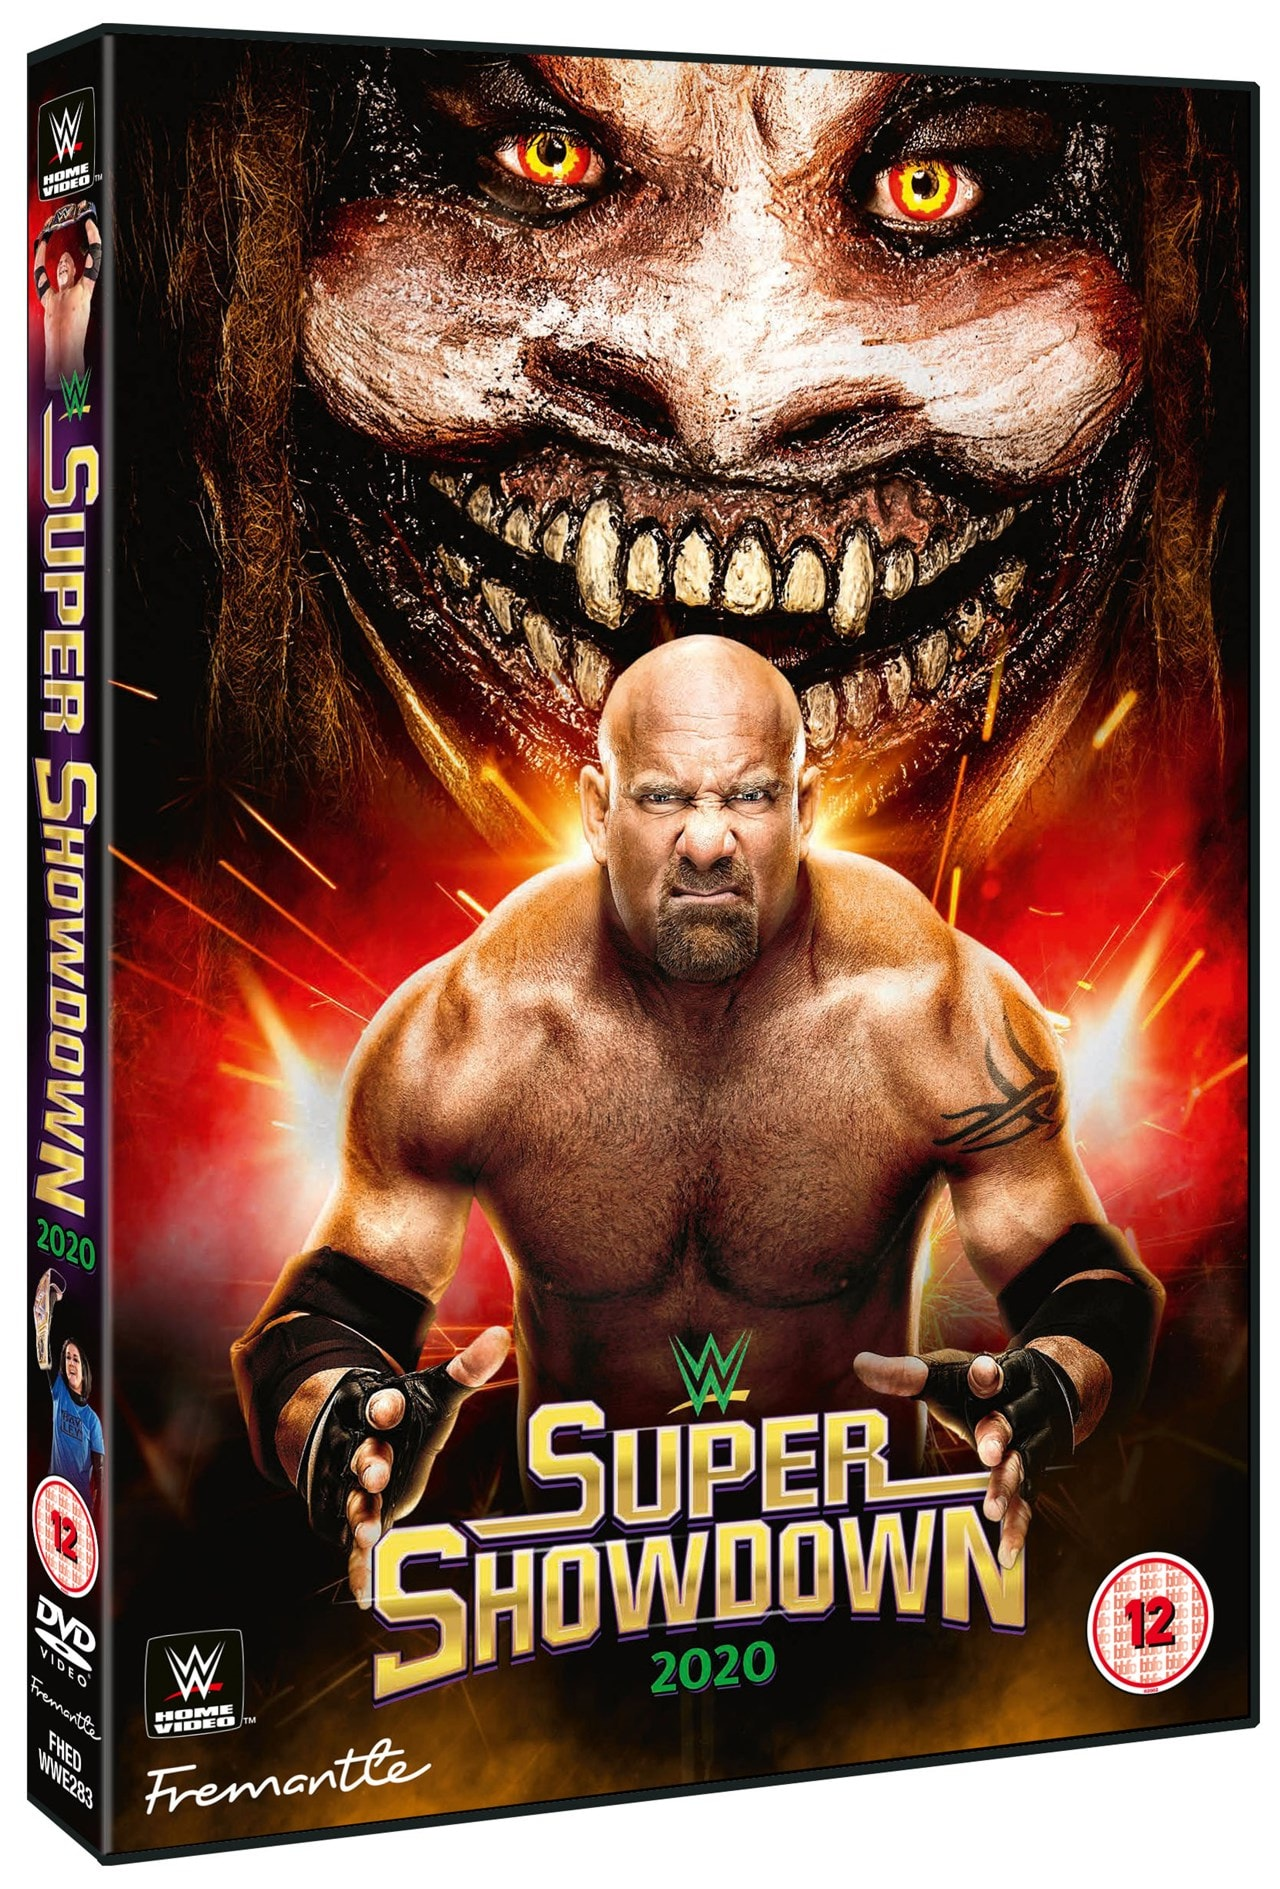 WWE: Super Showdown 2020 - 2